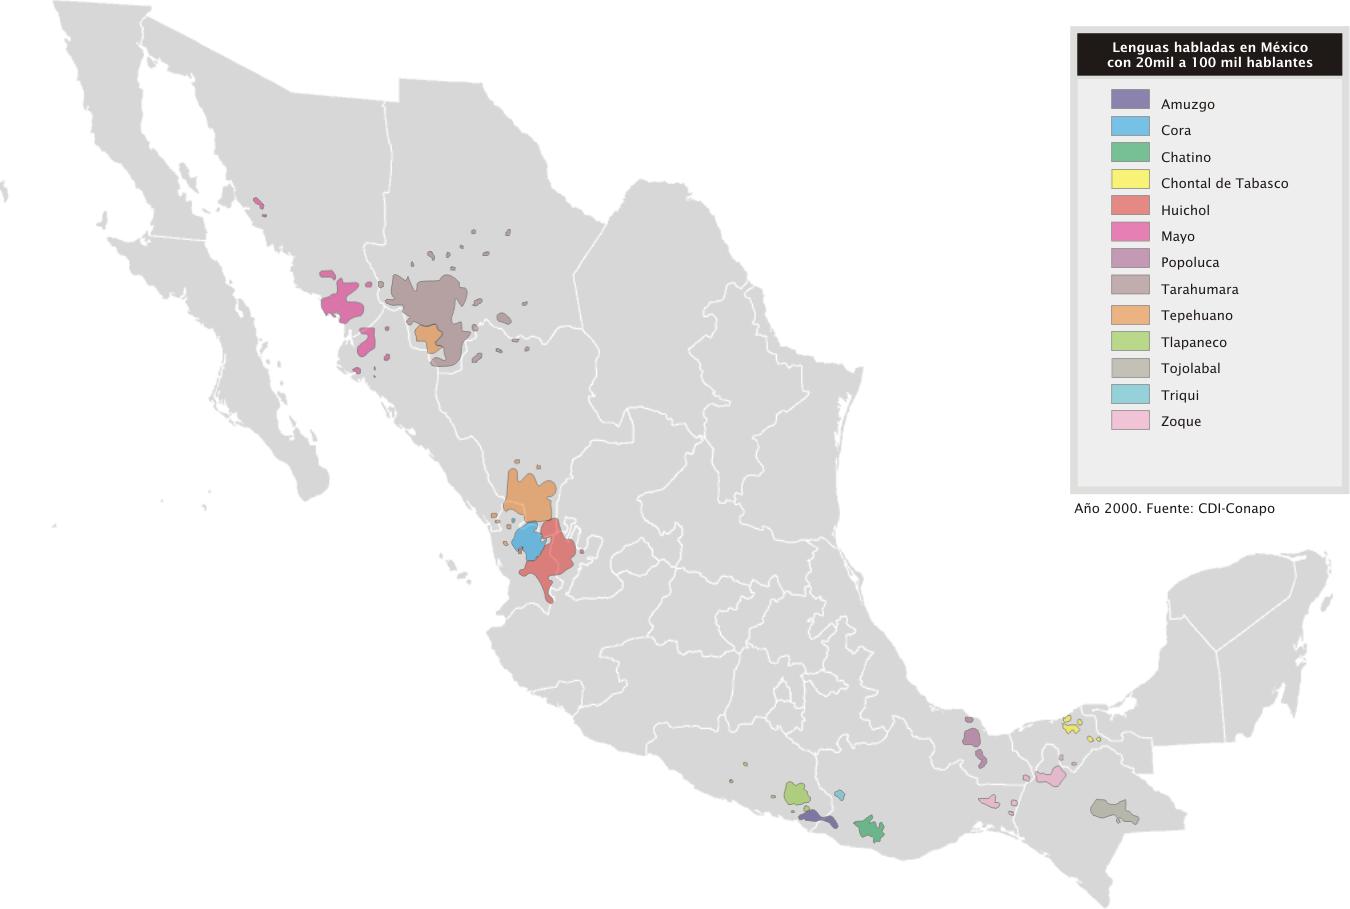 File:Mapa de lenguas de México 20.000-100.000.png